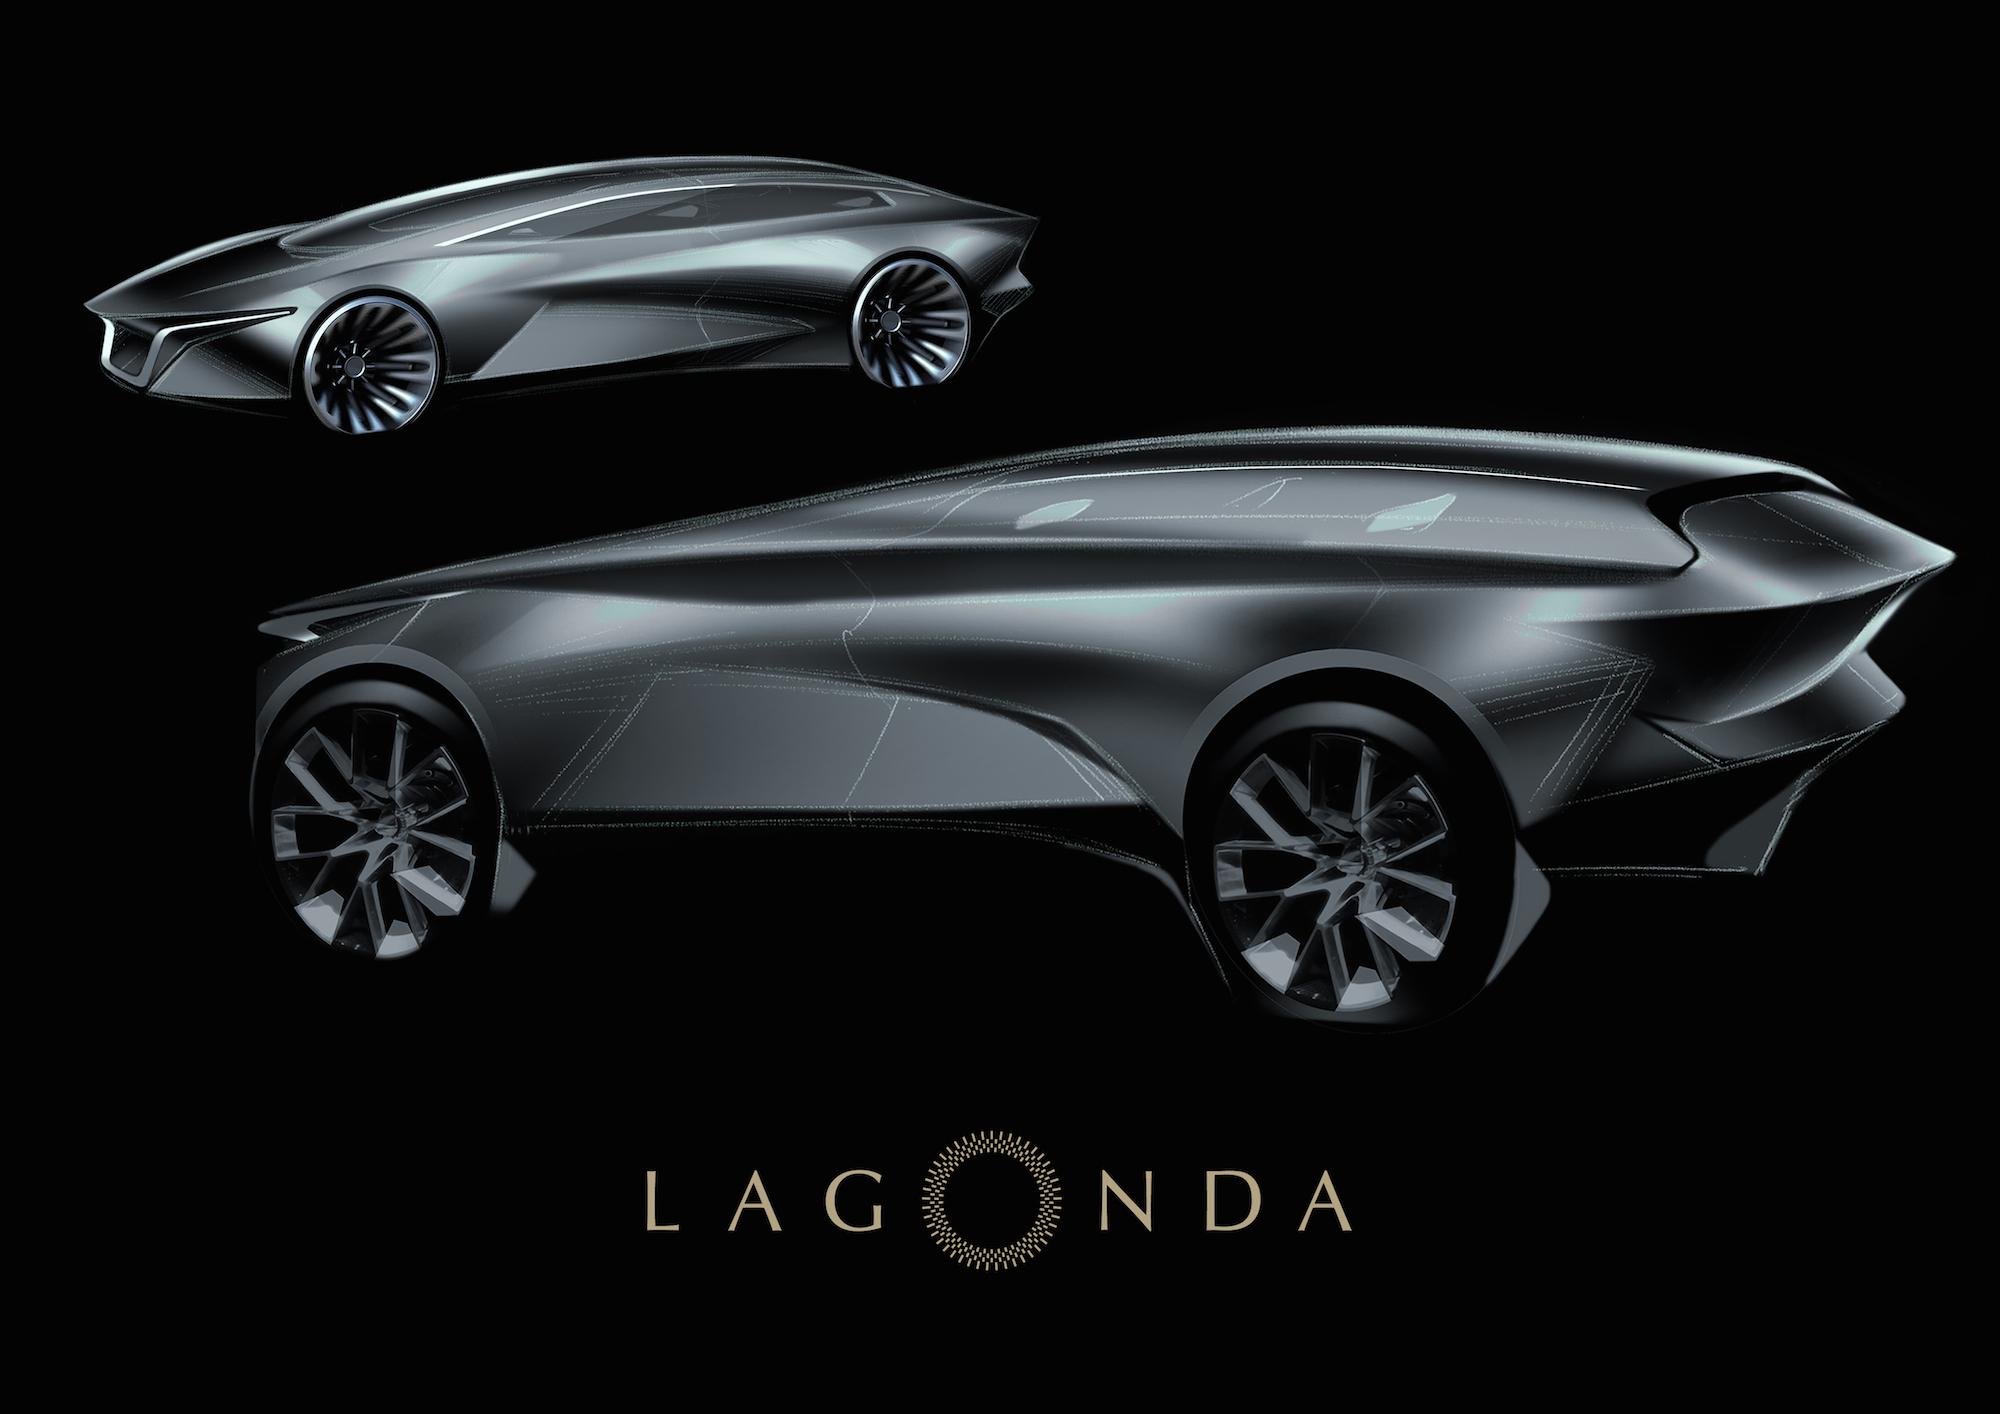 Lagonda SUV Will Retain The Boldness Of The Vision Concept